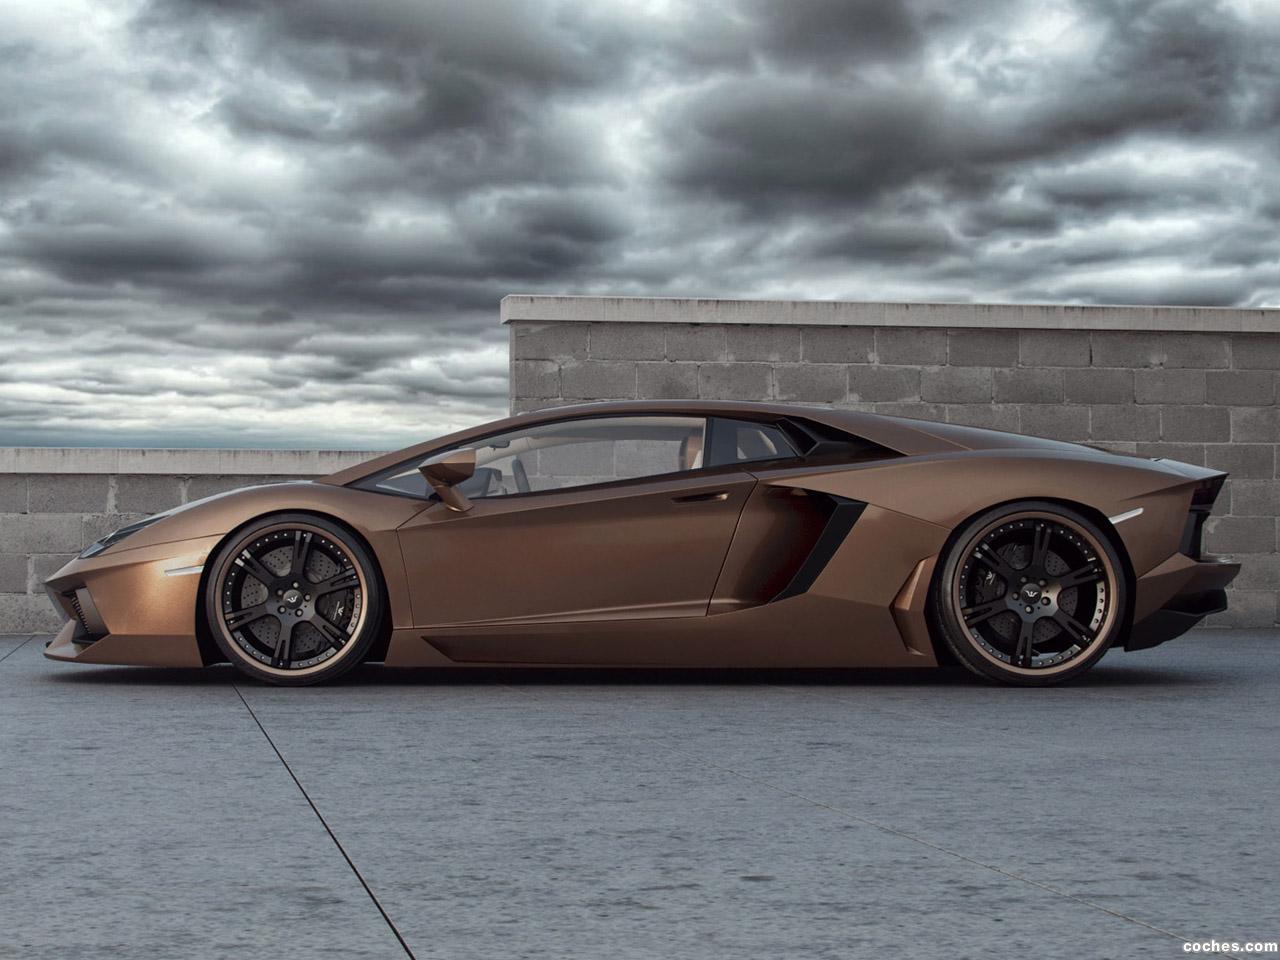 Foto 2 de Wheelsandmore Lamborghini Aventador Rabbioso 2012